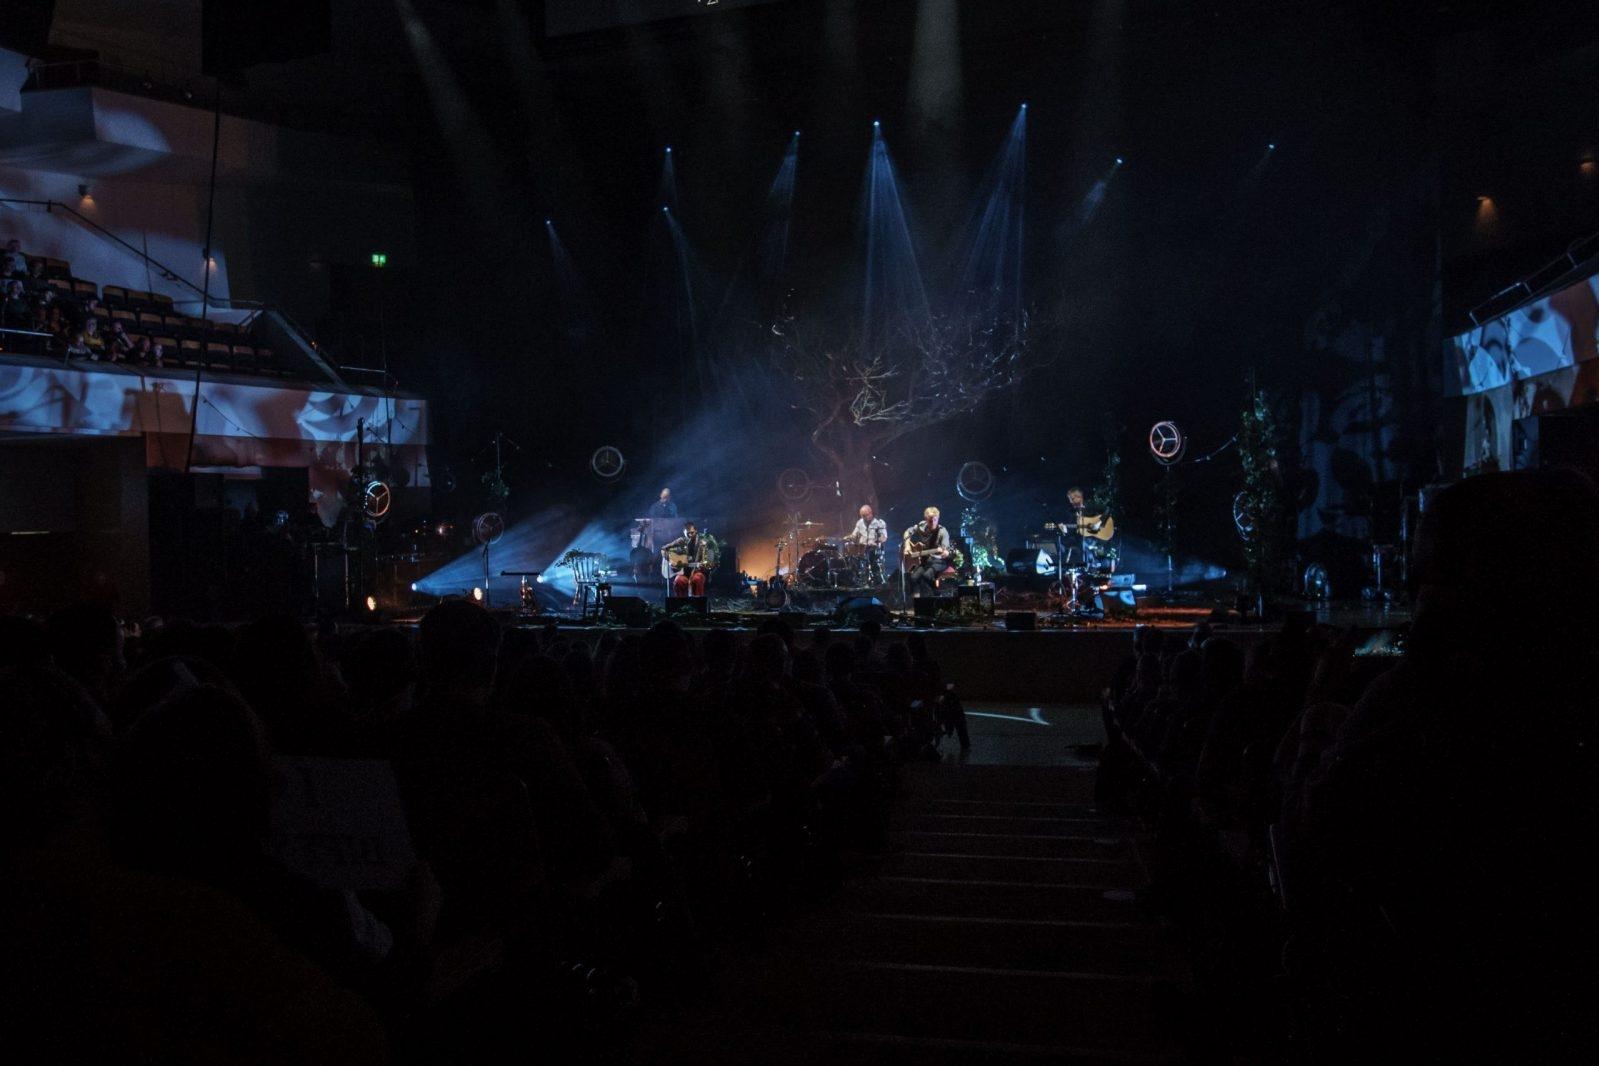 Biffy Clyro - MTV Unplugged - The Waterfront Hall